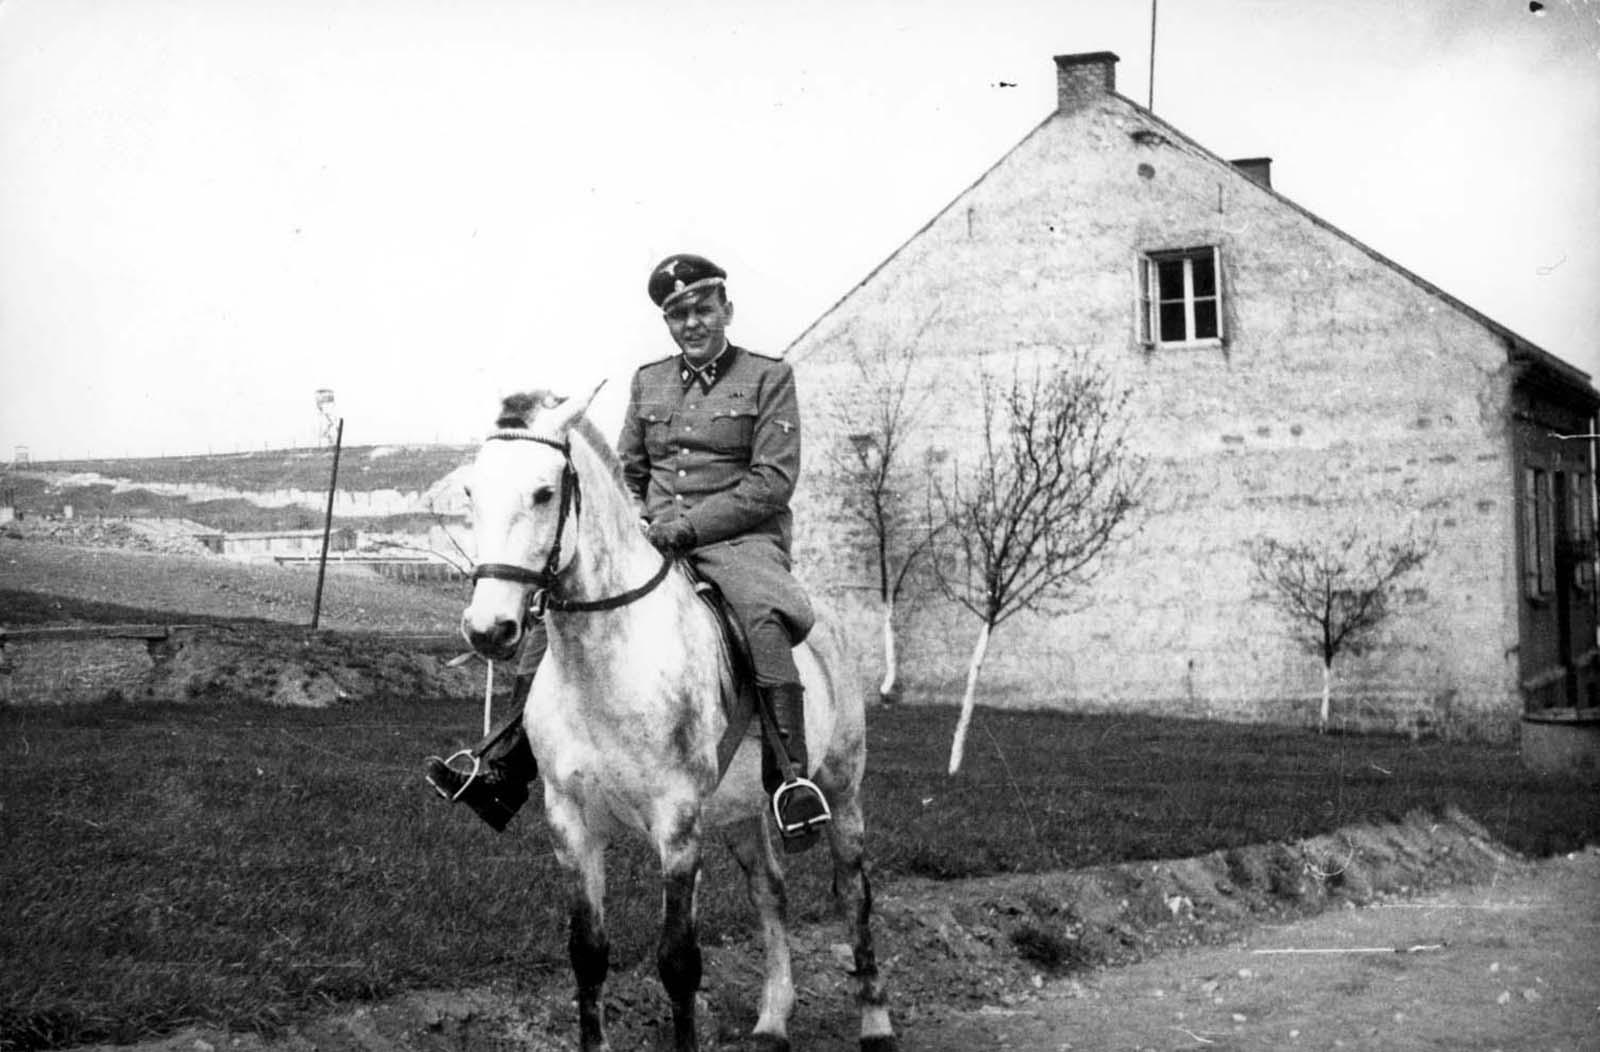 Camp Commandant Amon L. Goeth, riding a horse. Plaszow, Poland.